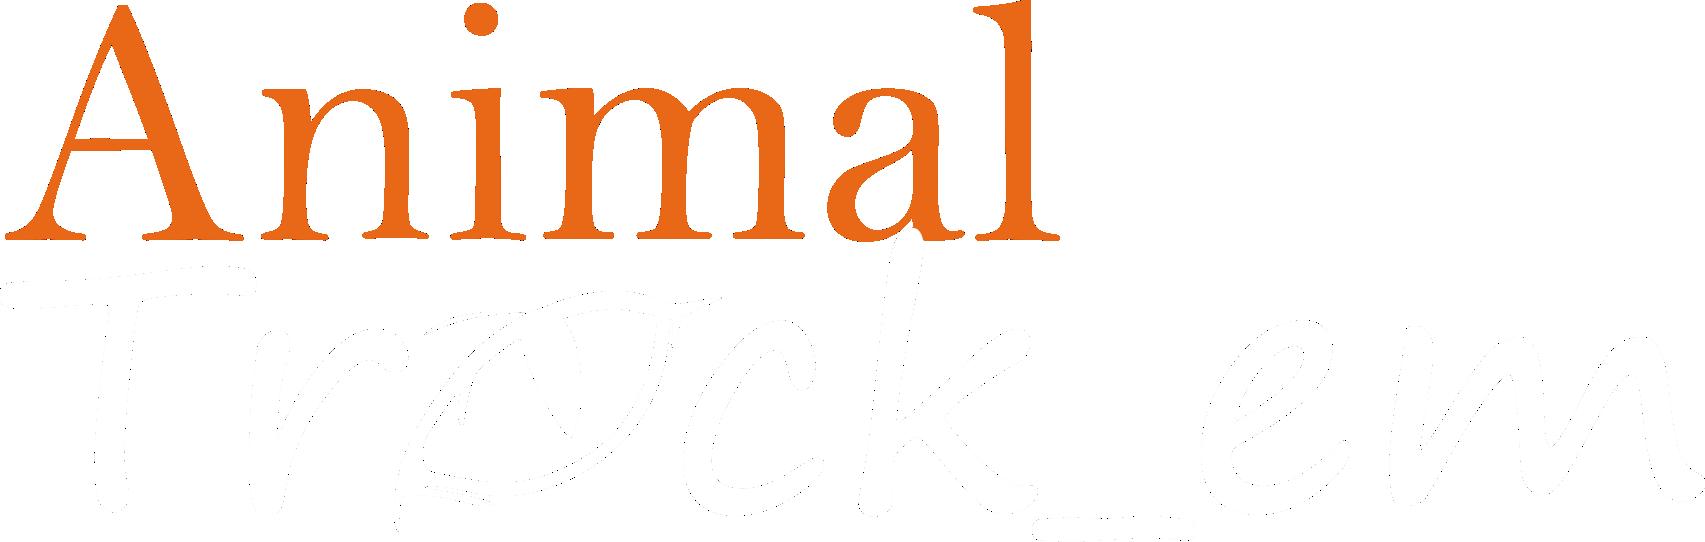 Animal Trackem